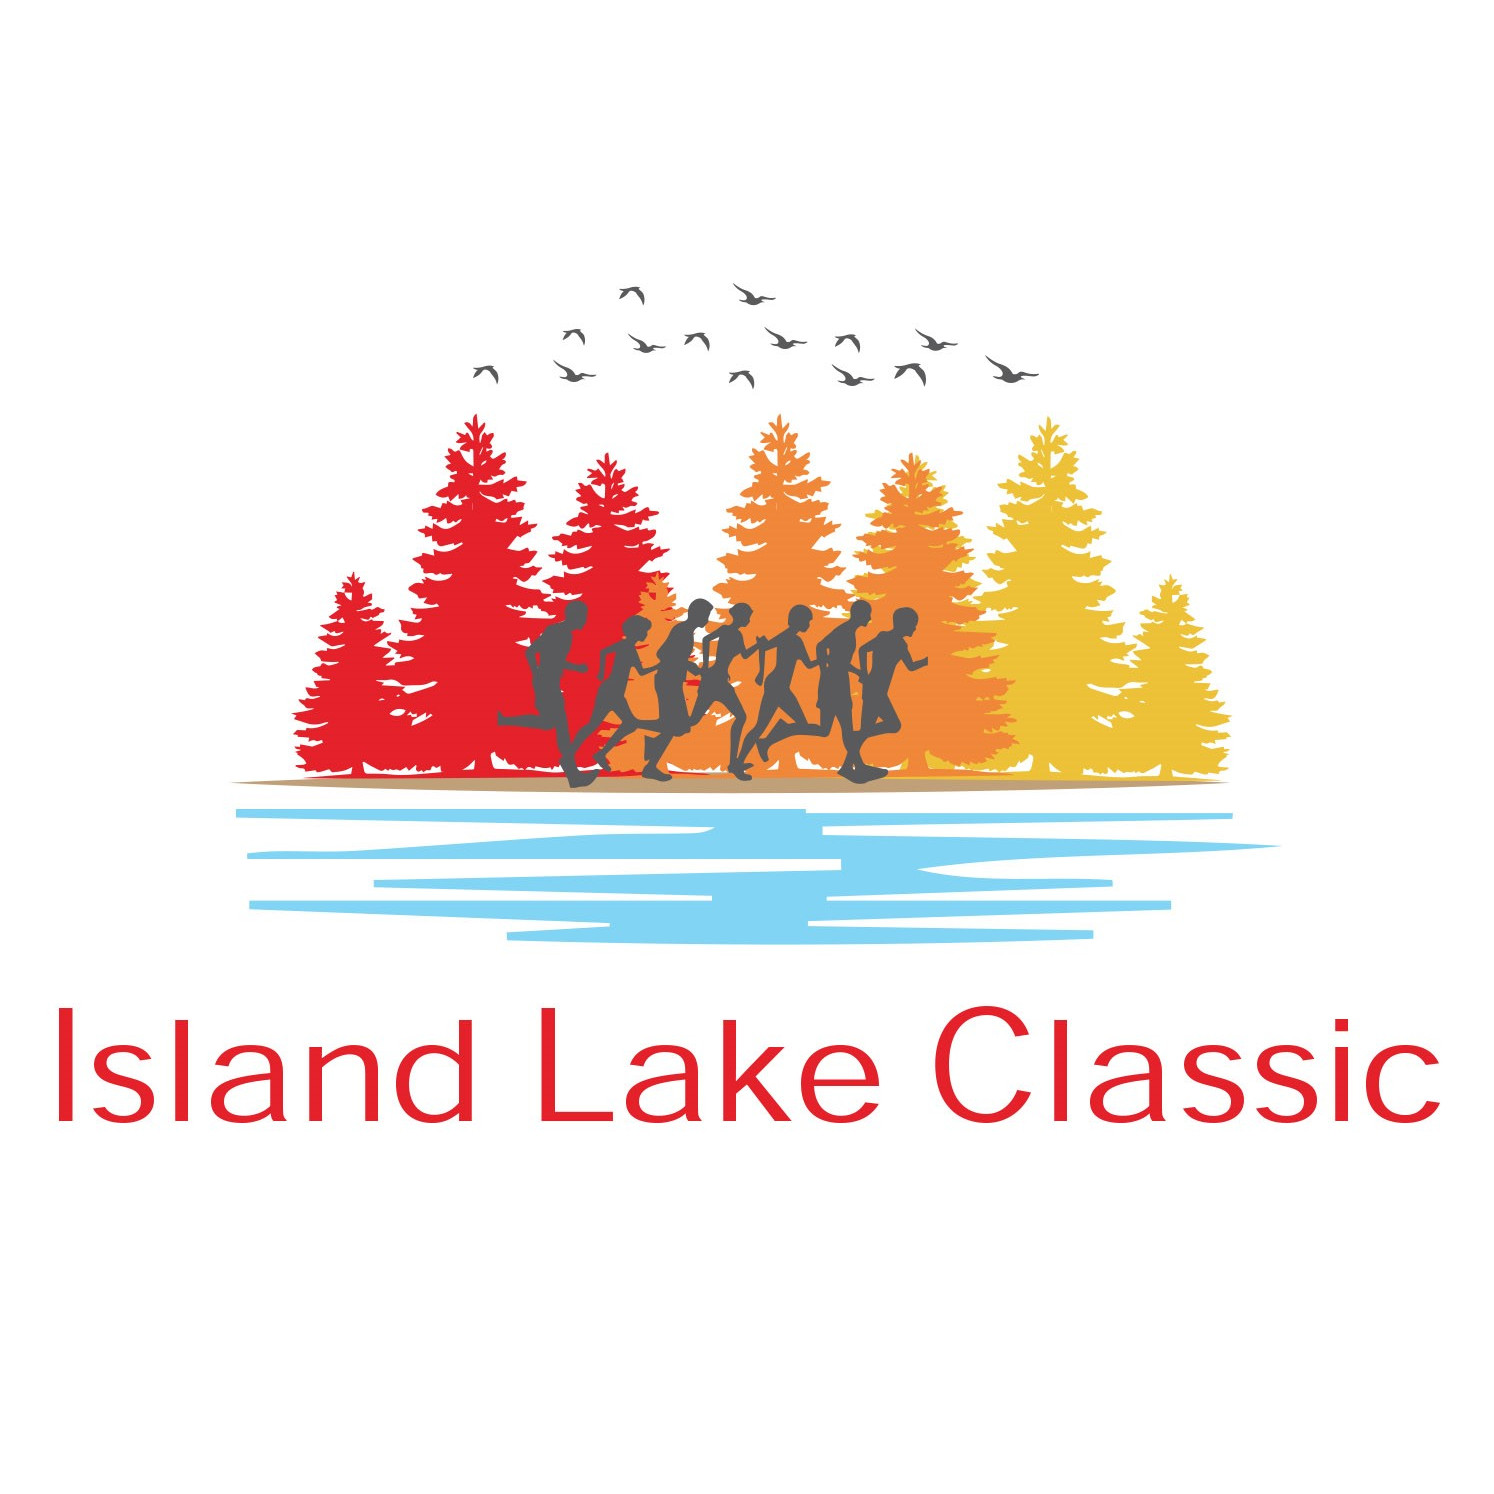 Island Lake Classic 2018